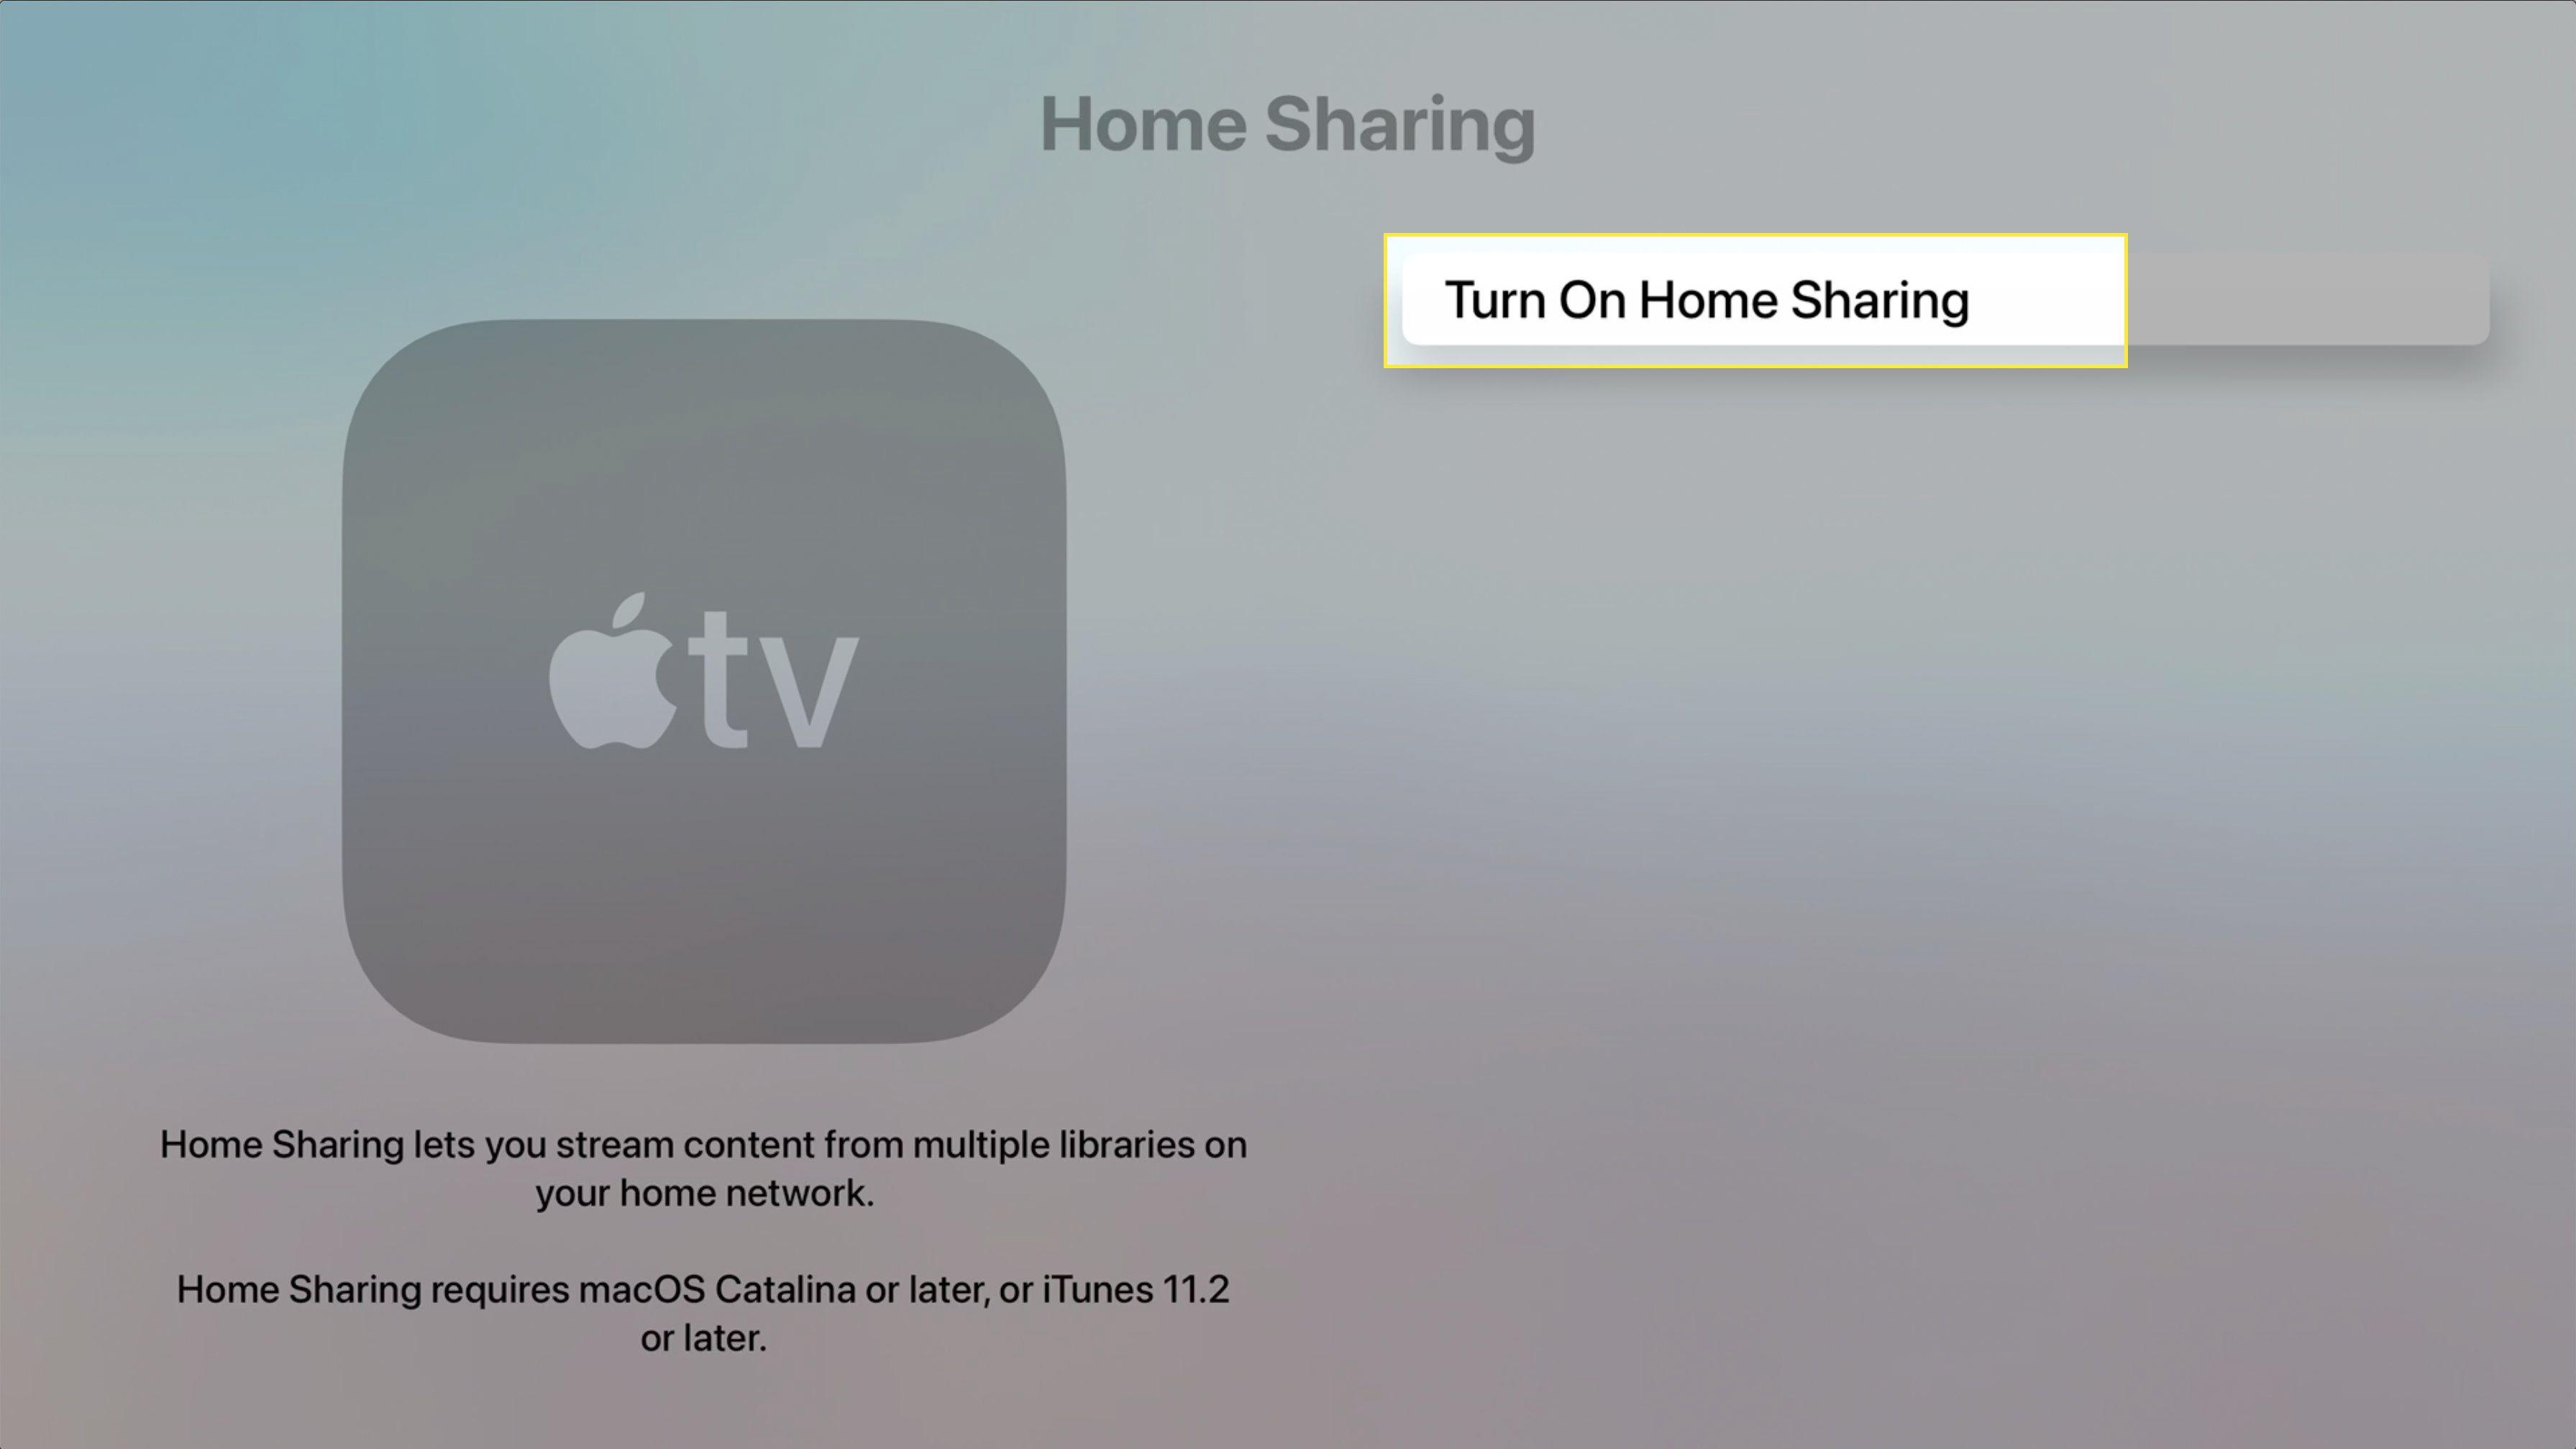 Apple TV Home Sharing screen highlighting